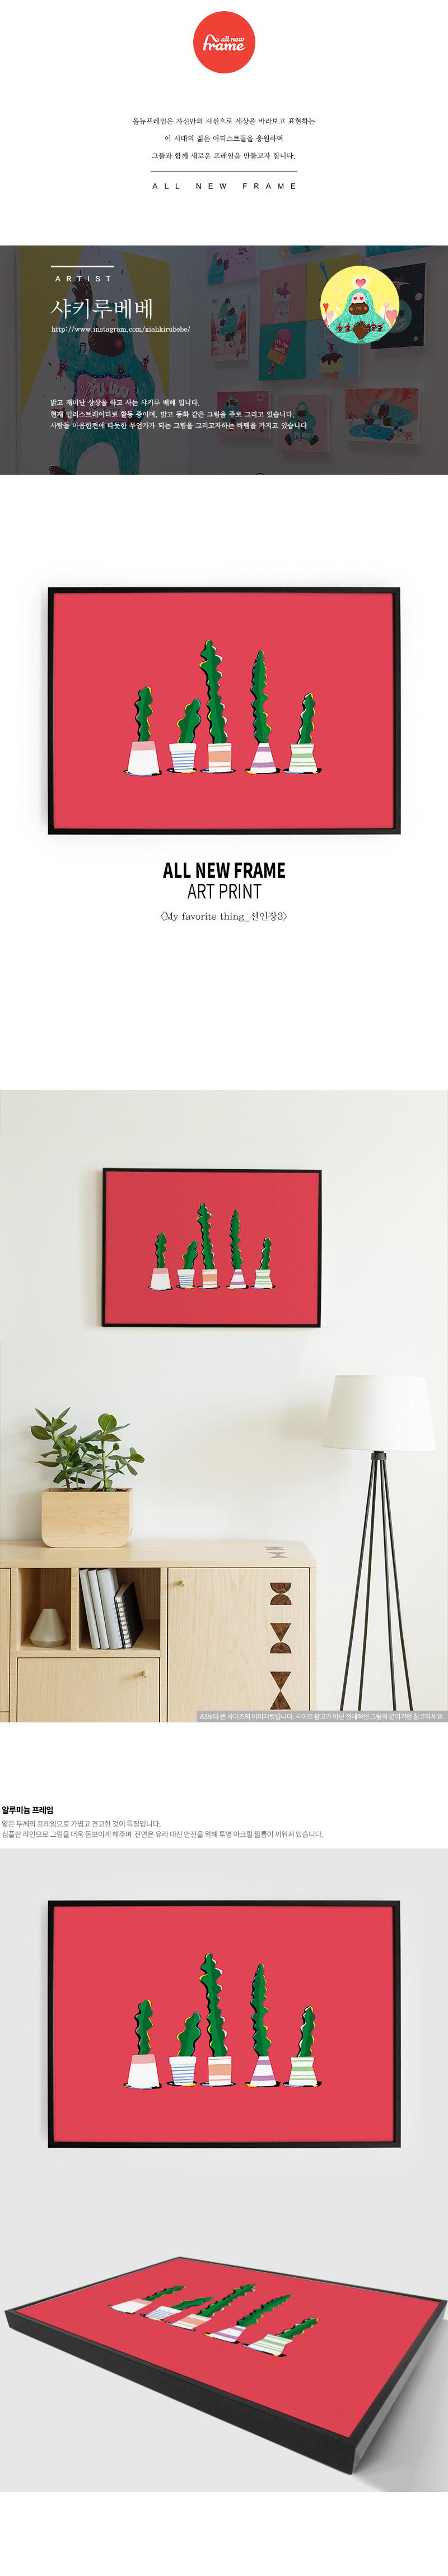 My favorite thing_선인장3- 일러스트 액자 - 올뉴프레임, 55,000원, 홈갤러리, 캔버스아트